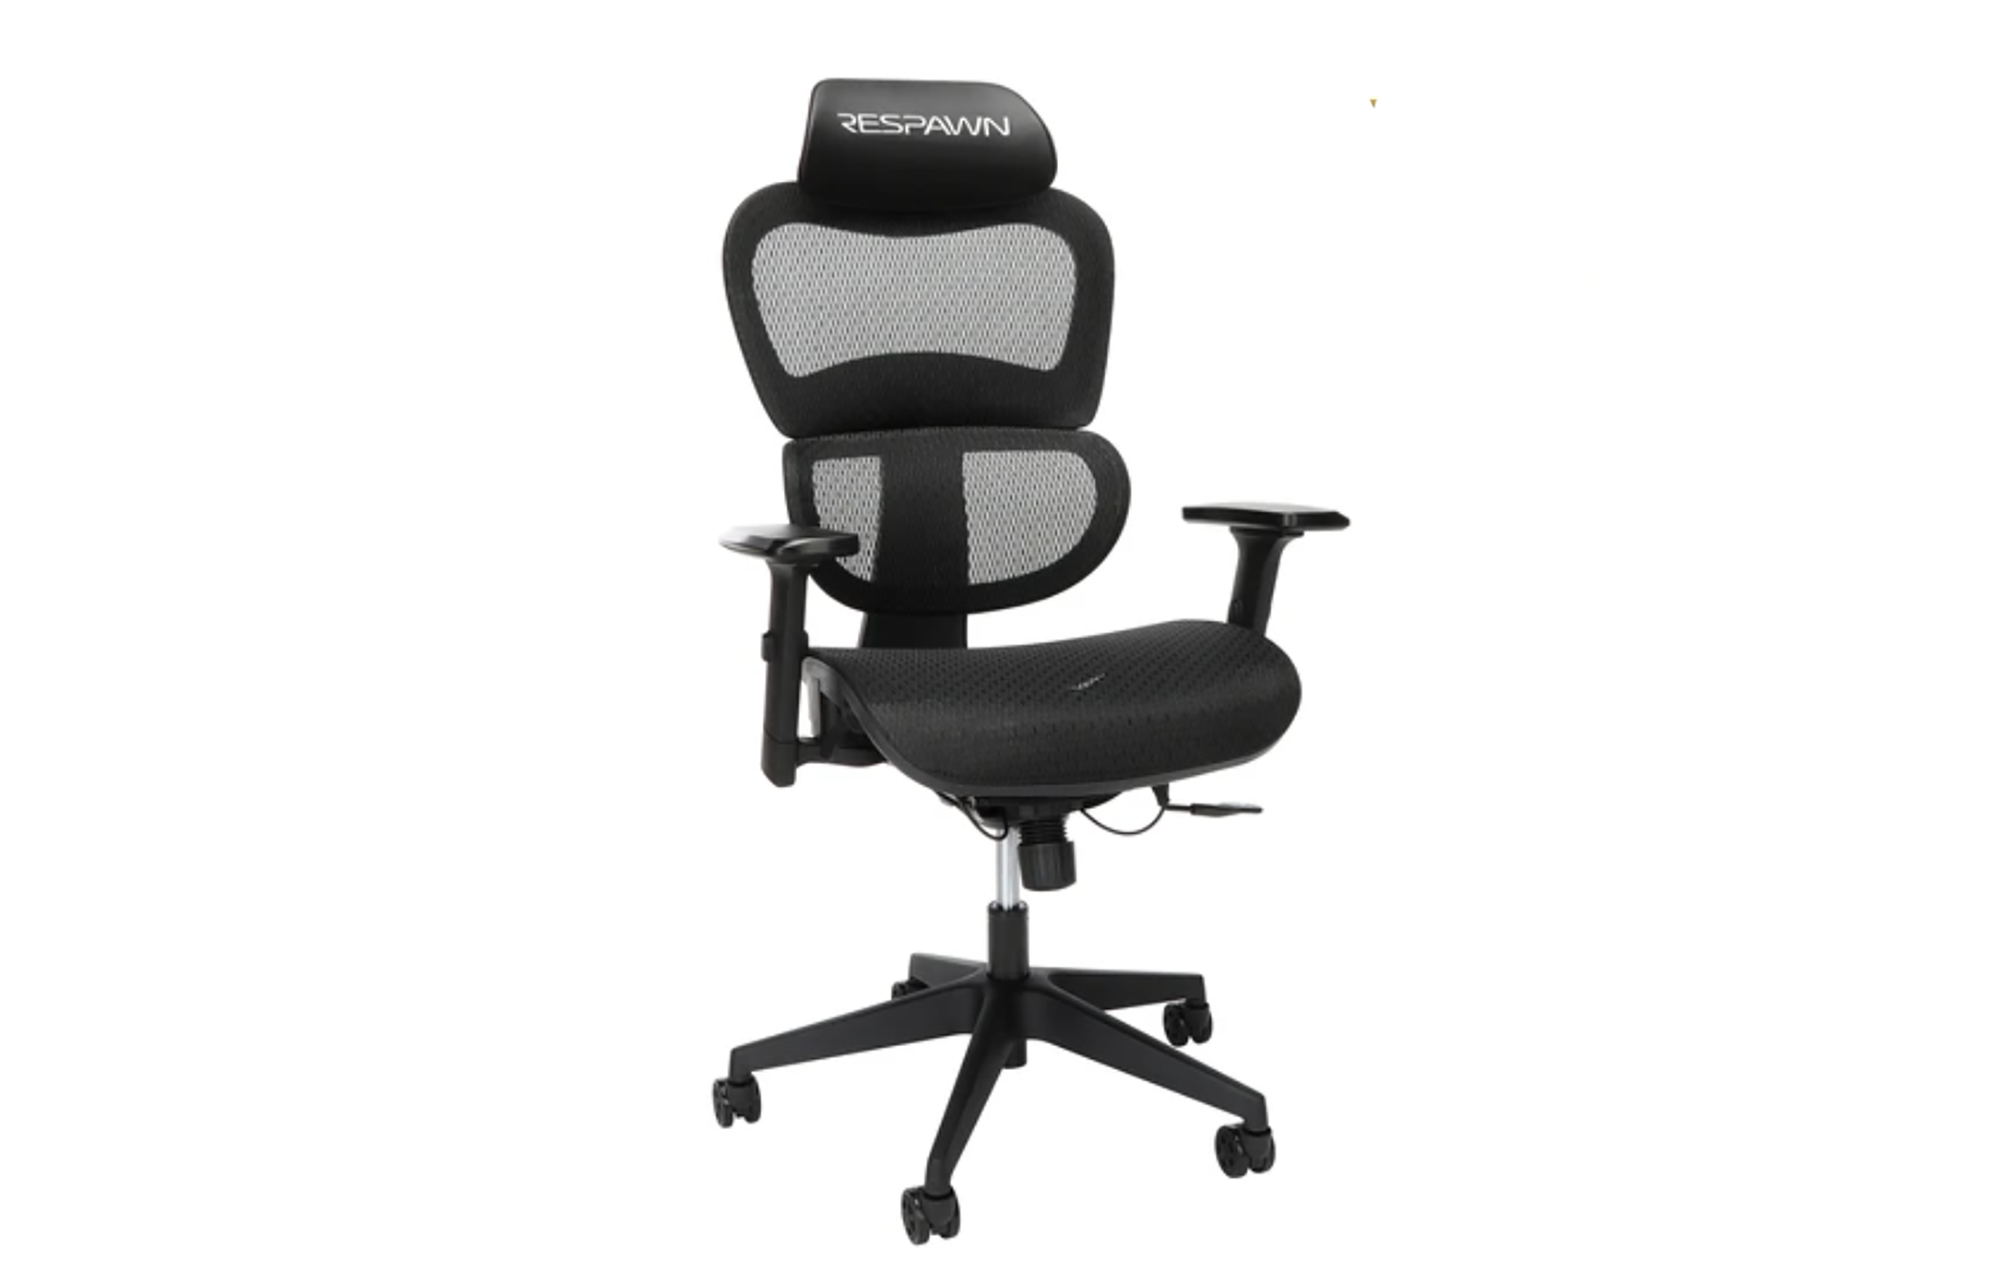 Respawn Specter Full Mesh Ergonomic Gaming Chair